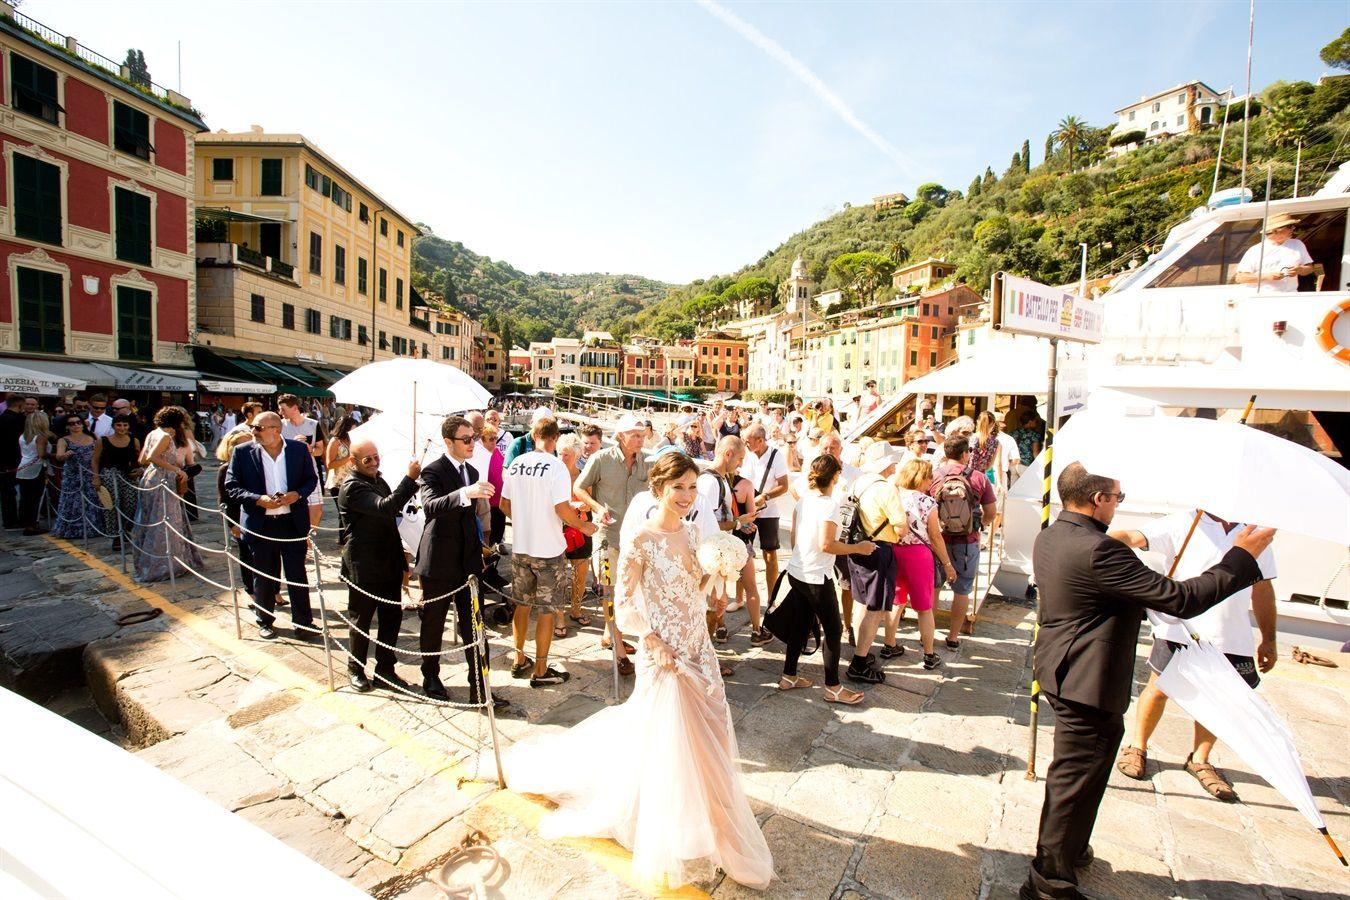 Gabriella Pession Sposa Richard Flood L Album Di Nozze Vanityfair It Matrimonio A Sorpresa Nozze Matrimonio